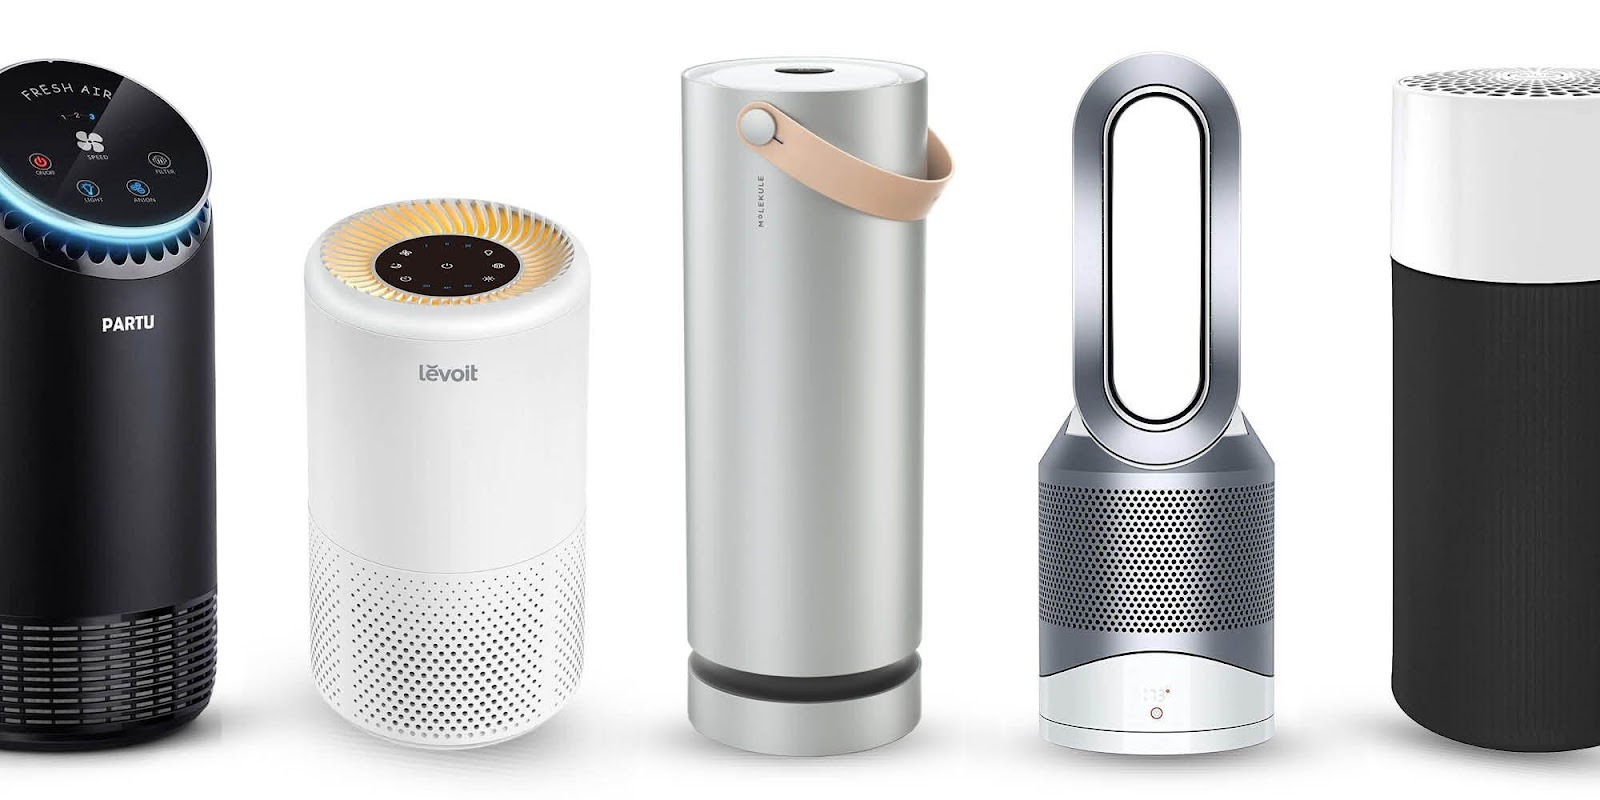 https://www.openthenews.com/wp-content/uploads/2020/07/Air-Purifiers-for-Allergies.jpg